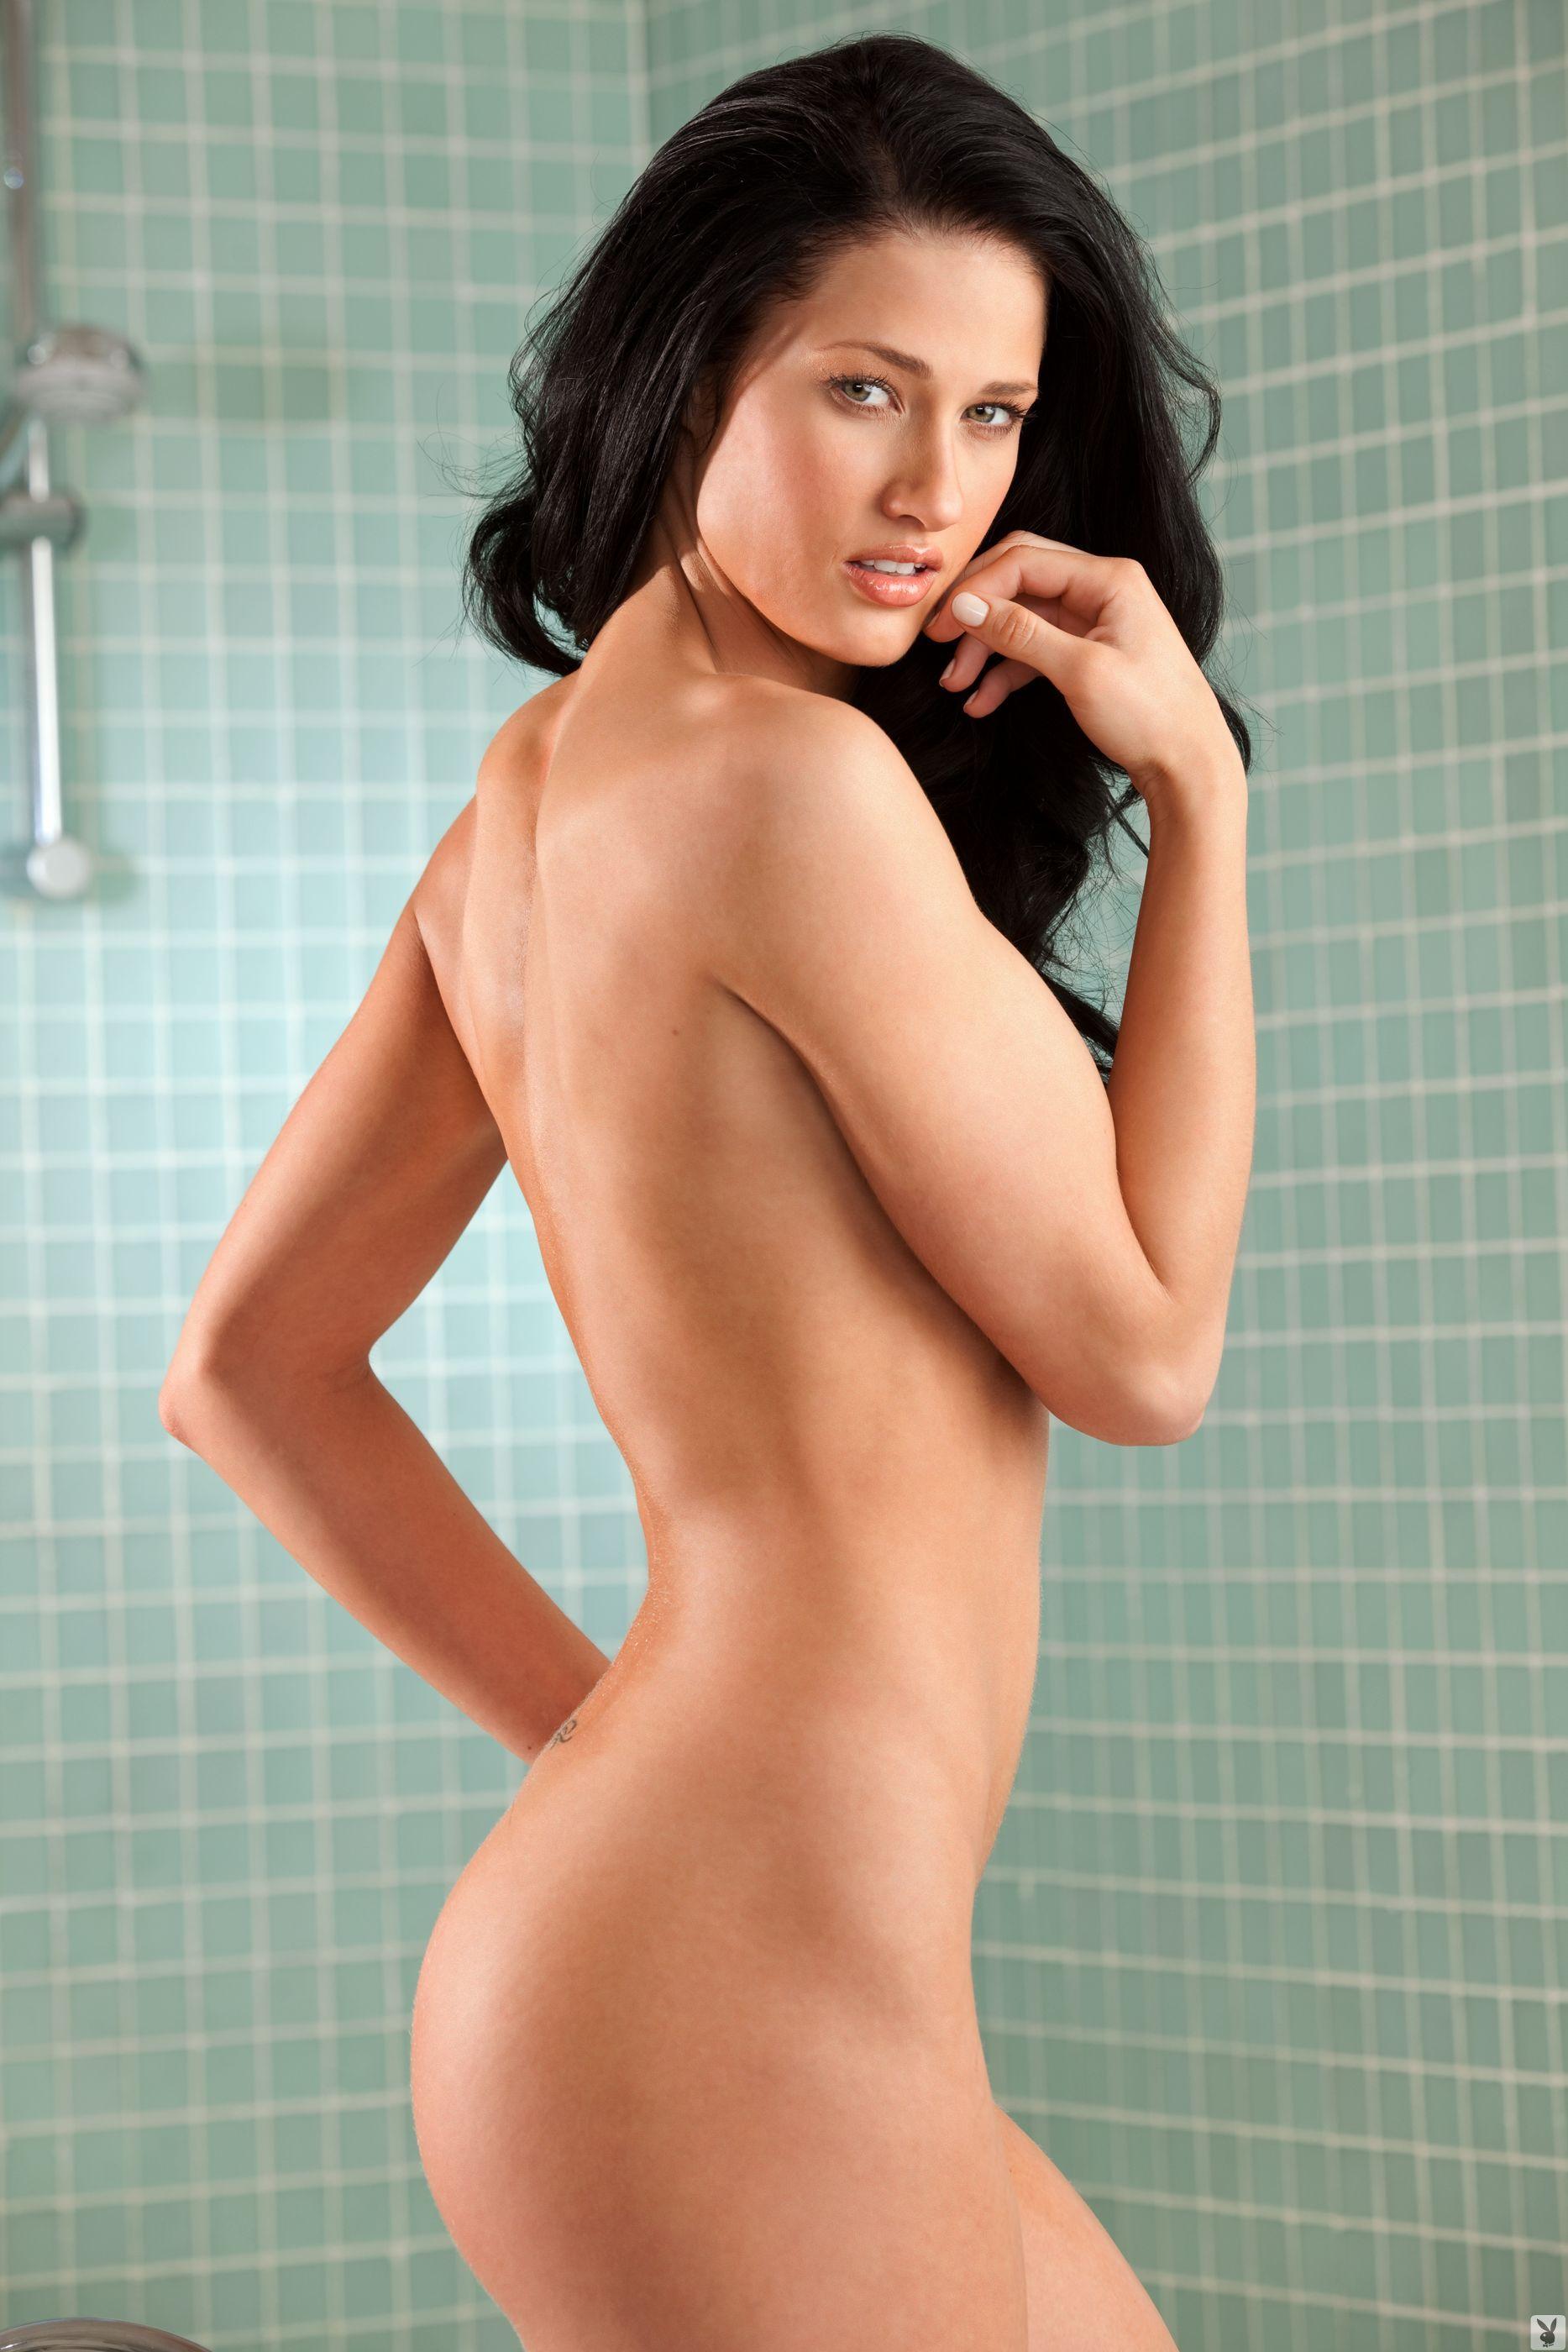 ashton-winters-brunette-nude-bathroom-playboy-02